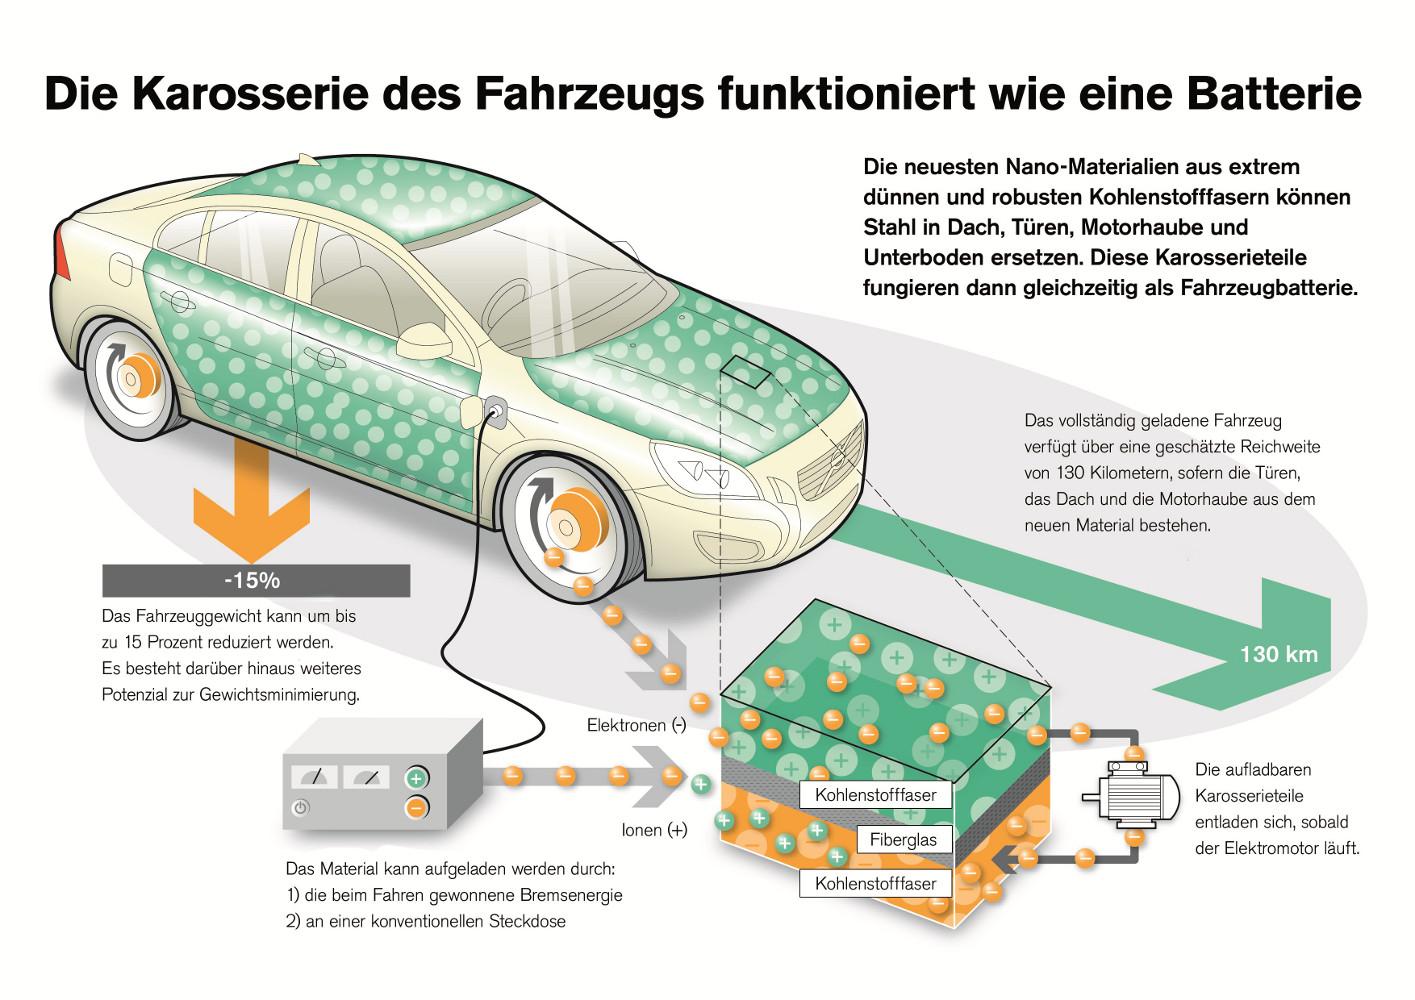 Volvo: Karosserie als Batterie | Elektroauto Blog